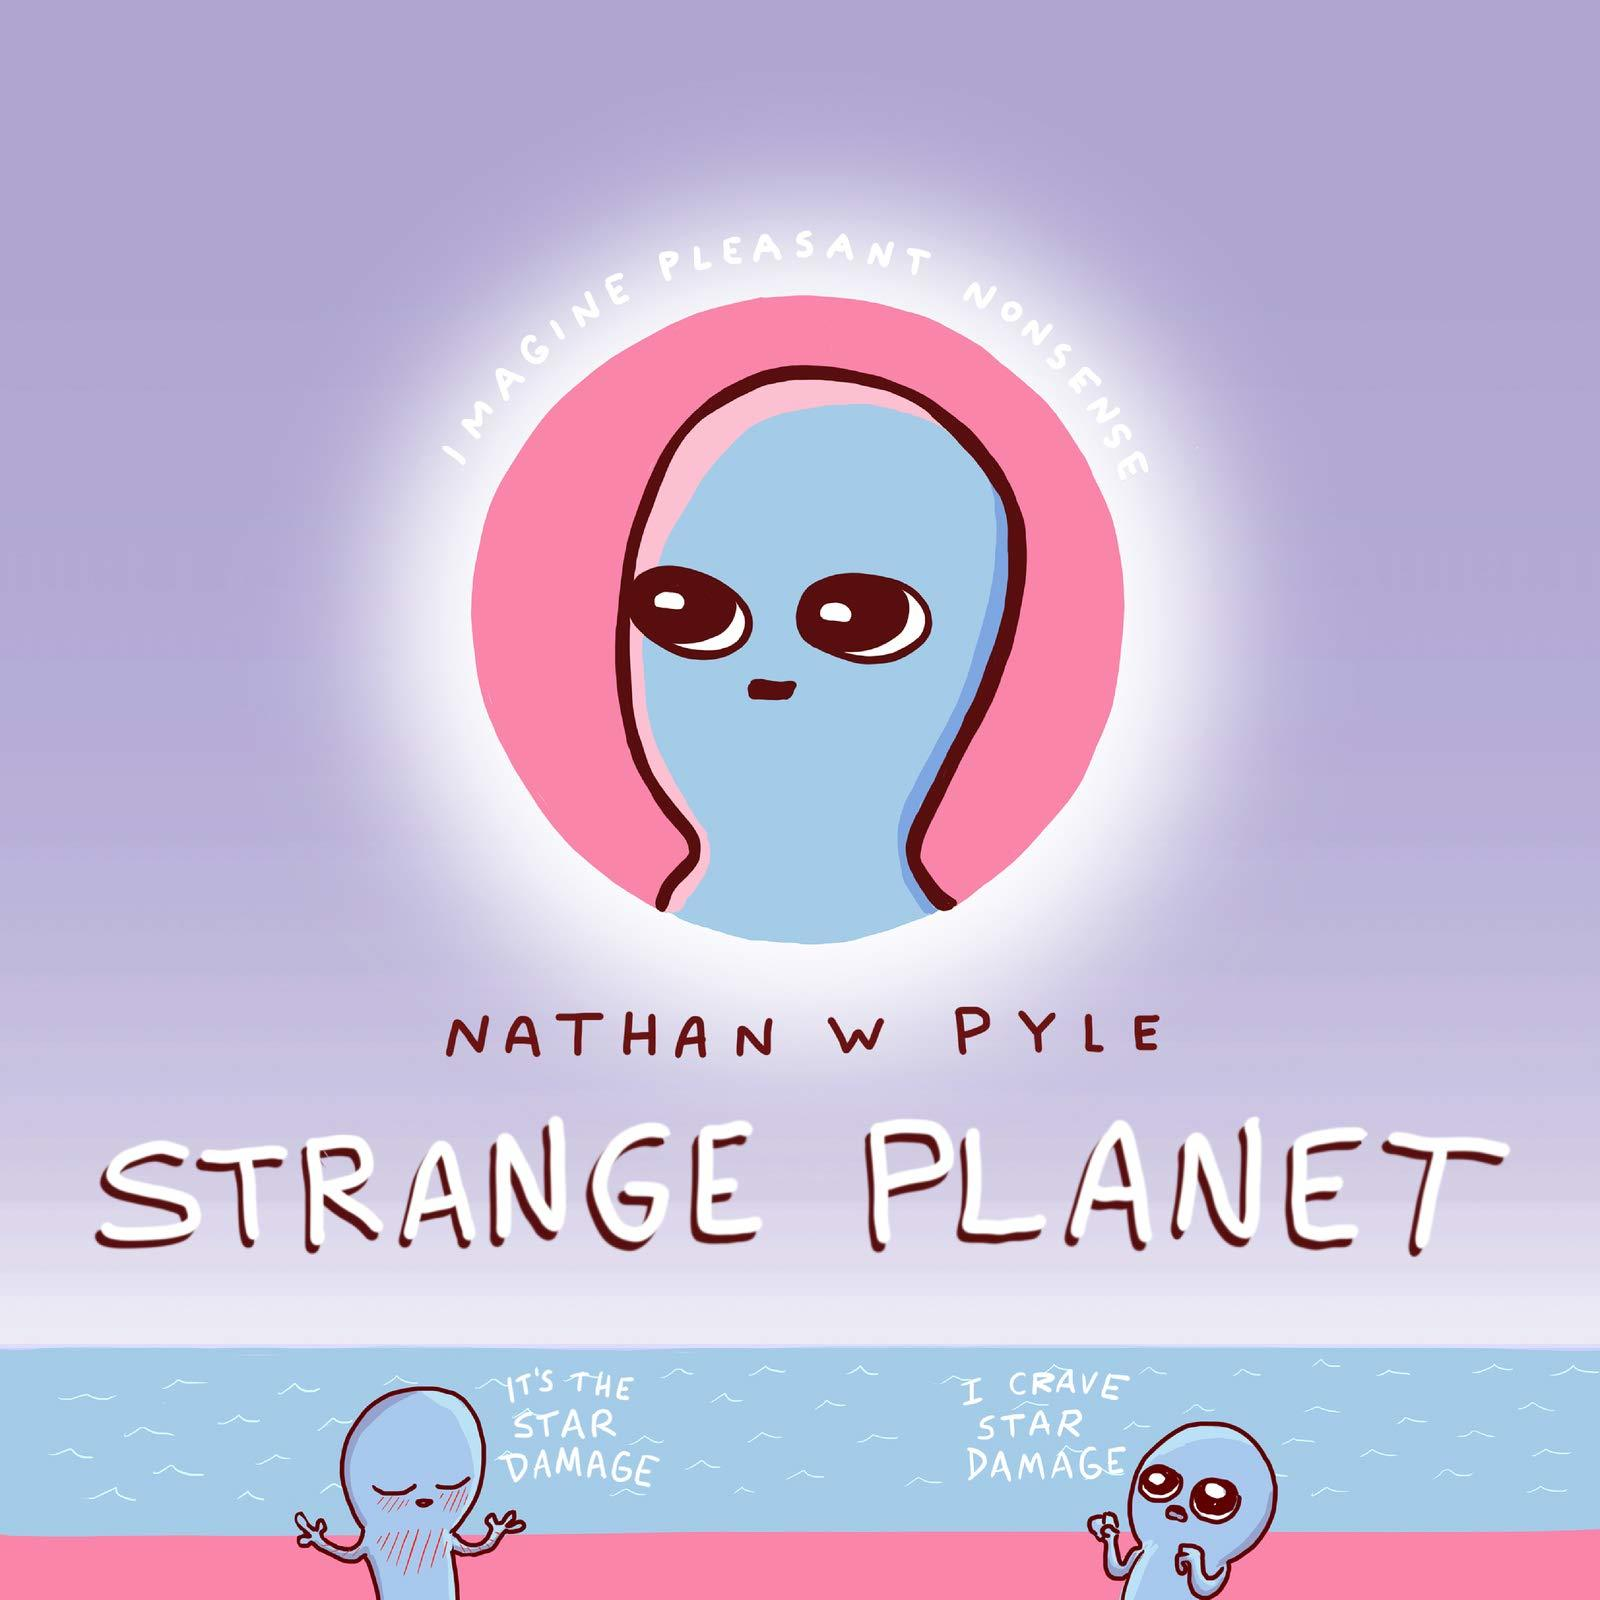 Strange Planet by Nathan W Pyle image